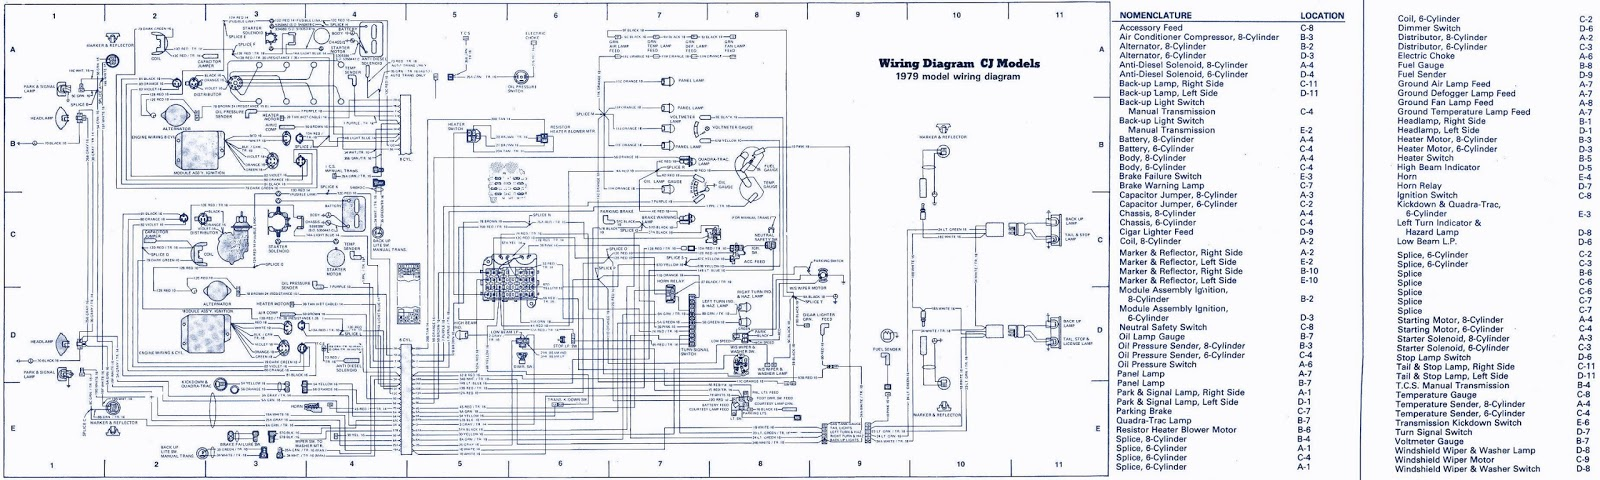 1979 Jeep CJ Electrical Wiring Diagram | Schematic Rise